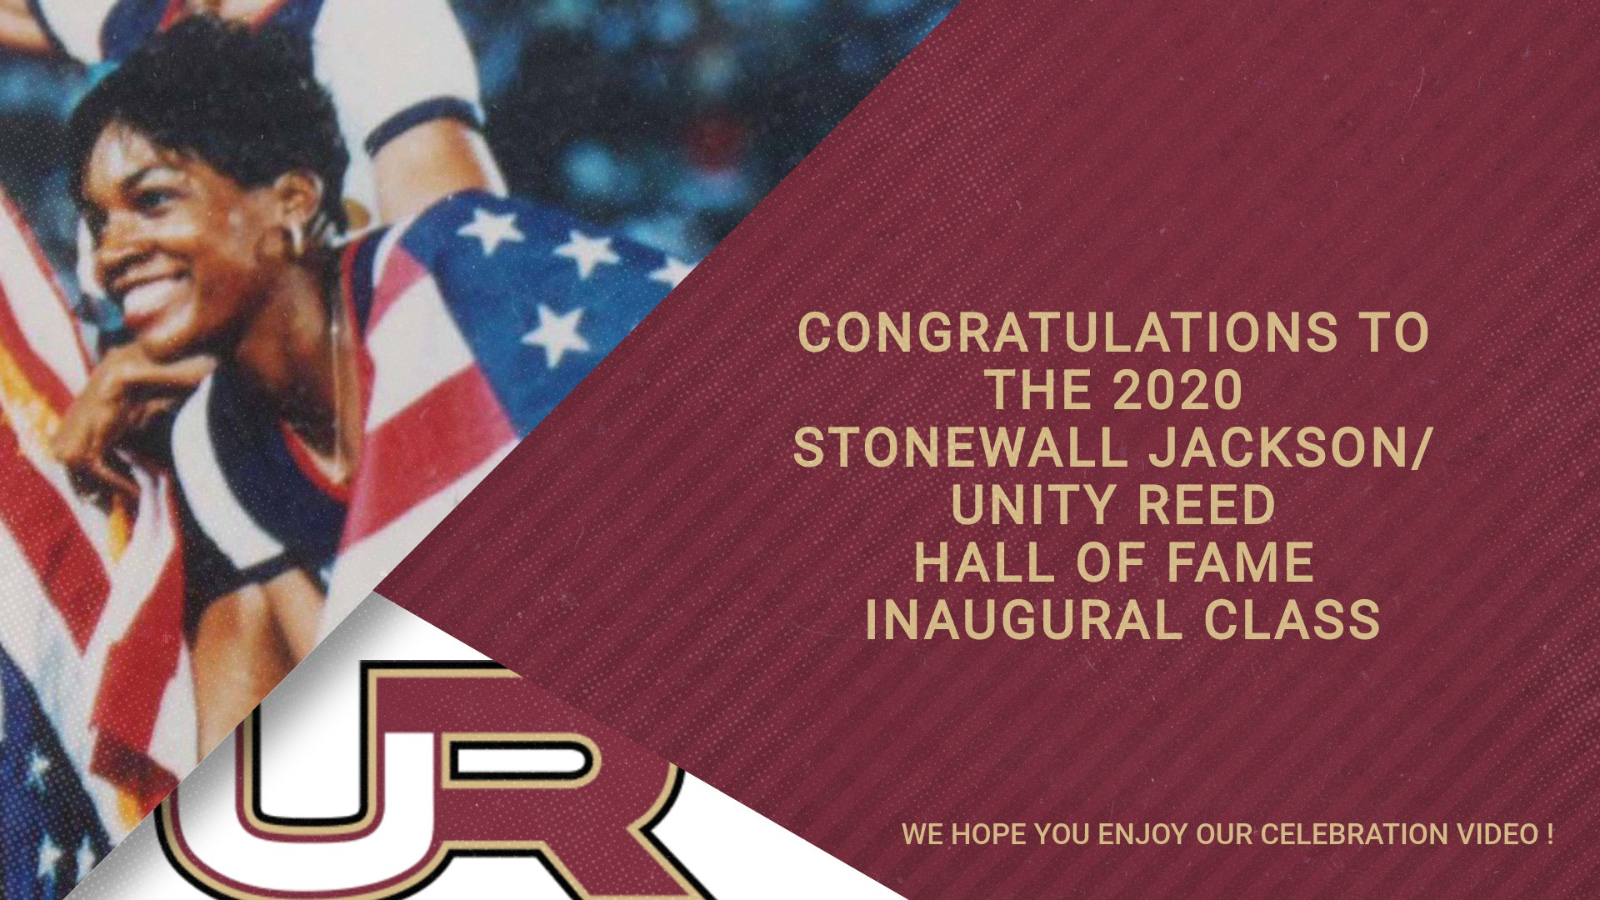 SJ/UR Hall of Fame Inaugural Class Celebration Video!